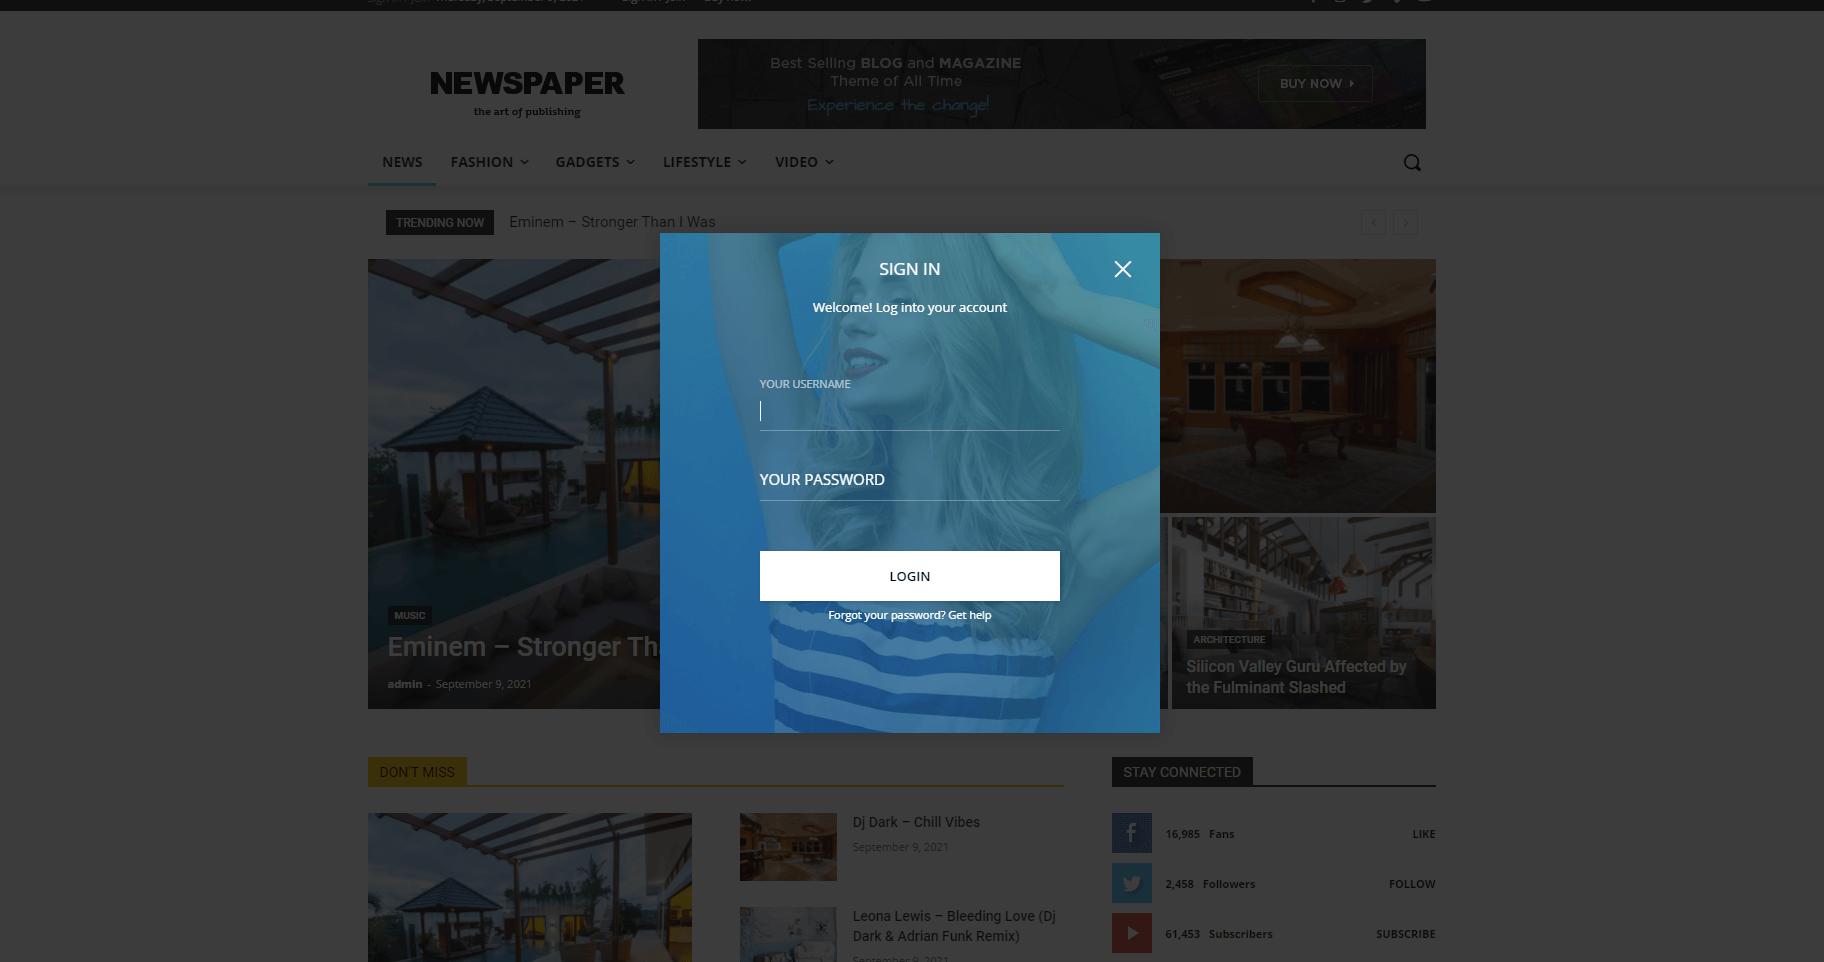 Newspaper Login Modal in User Registration